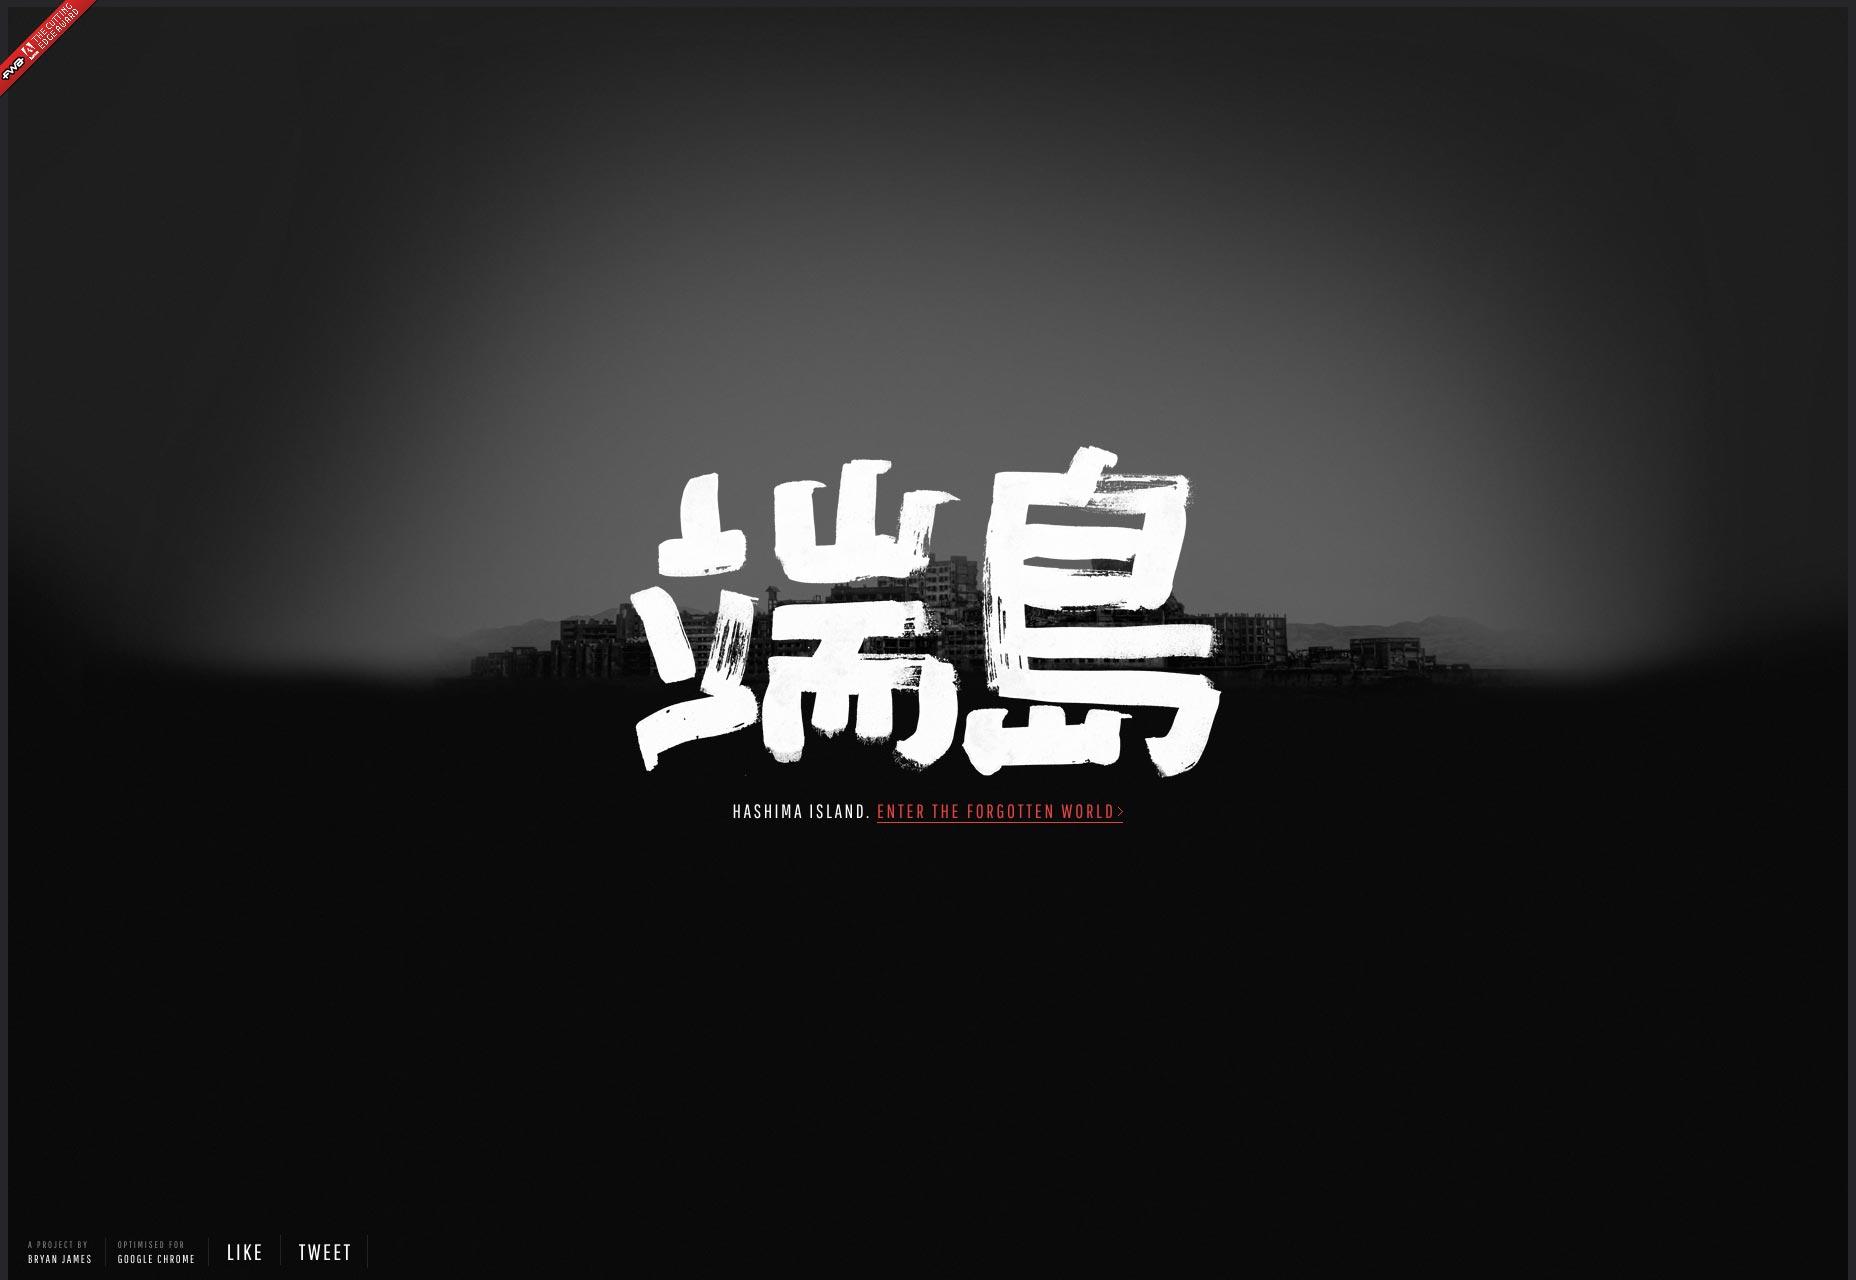 03-hashima_island